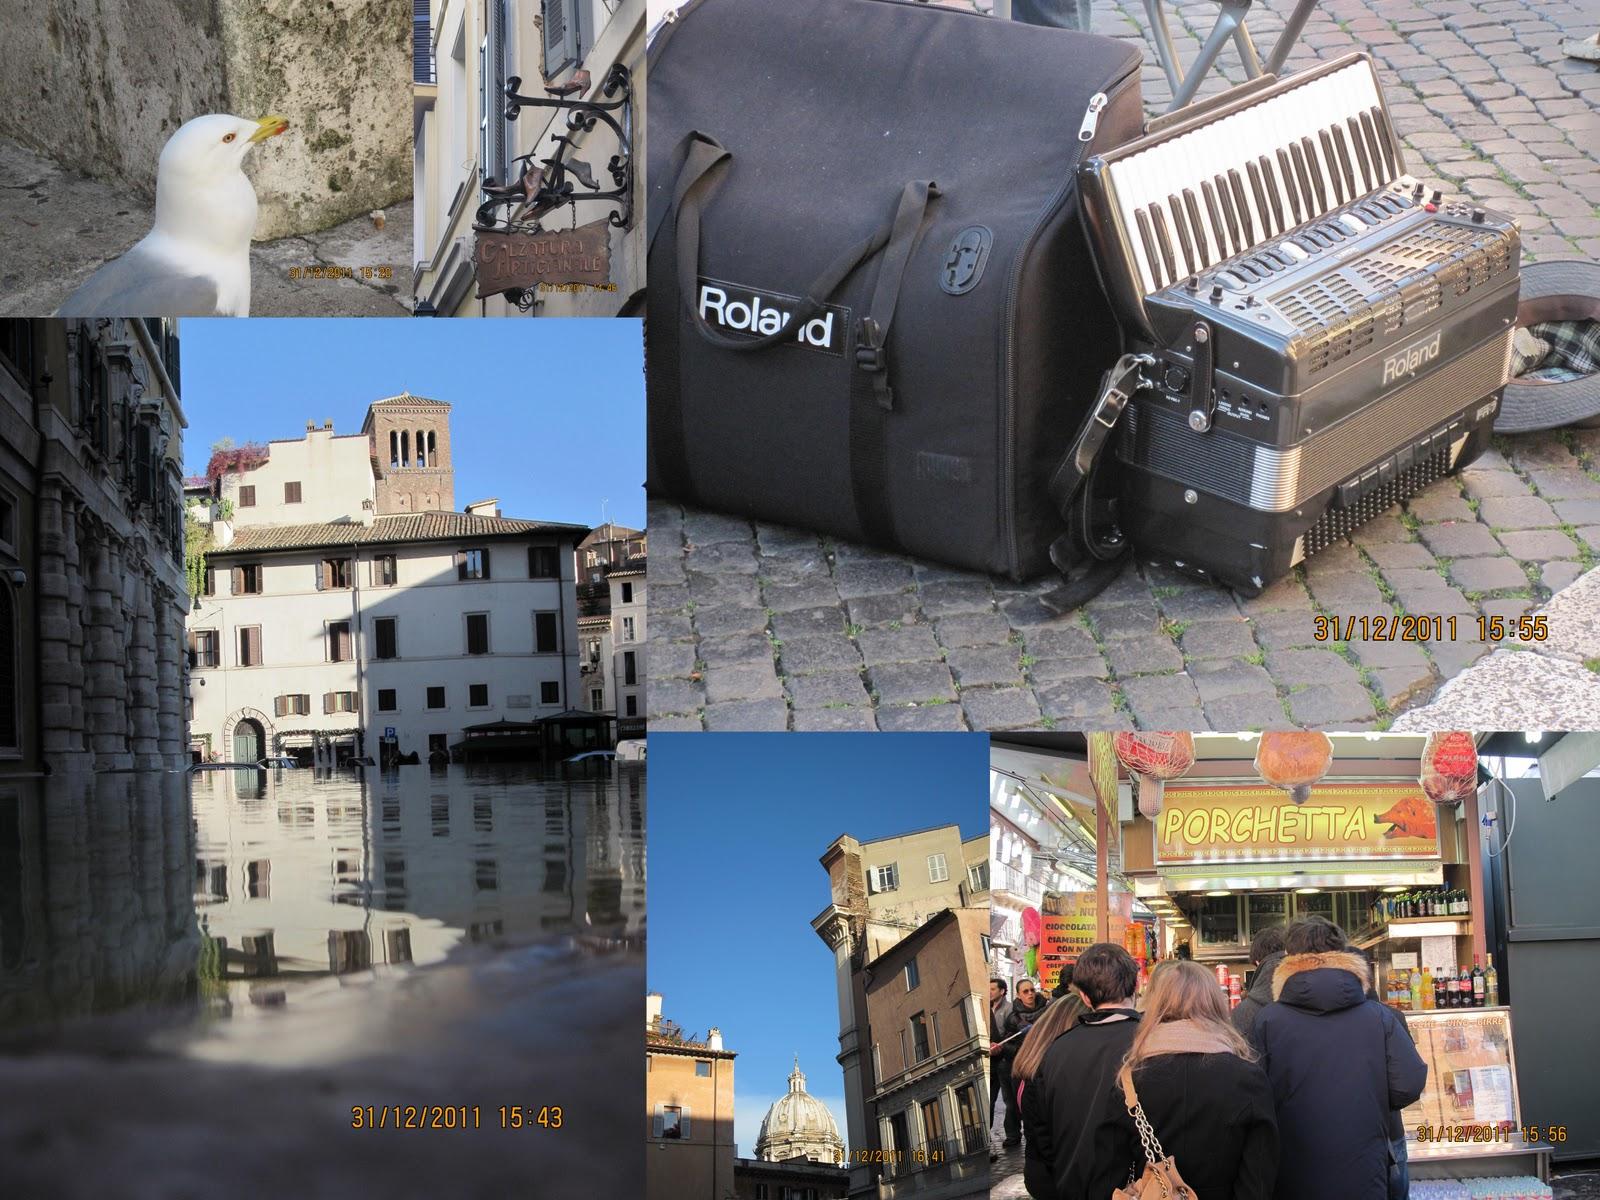 http://3.bp.blogspot.com/-tX567OzH9jo/TwiO5VcFO5I/AAAAAAAAAaM/gF3Wus2QTAc/s1600/Roma+20114.jpg